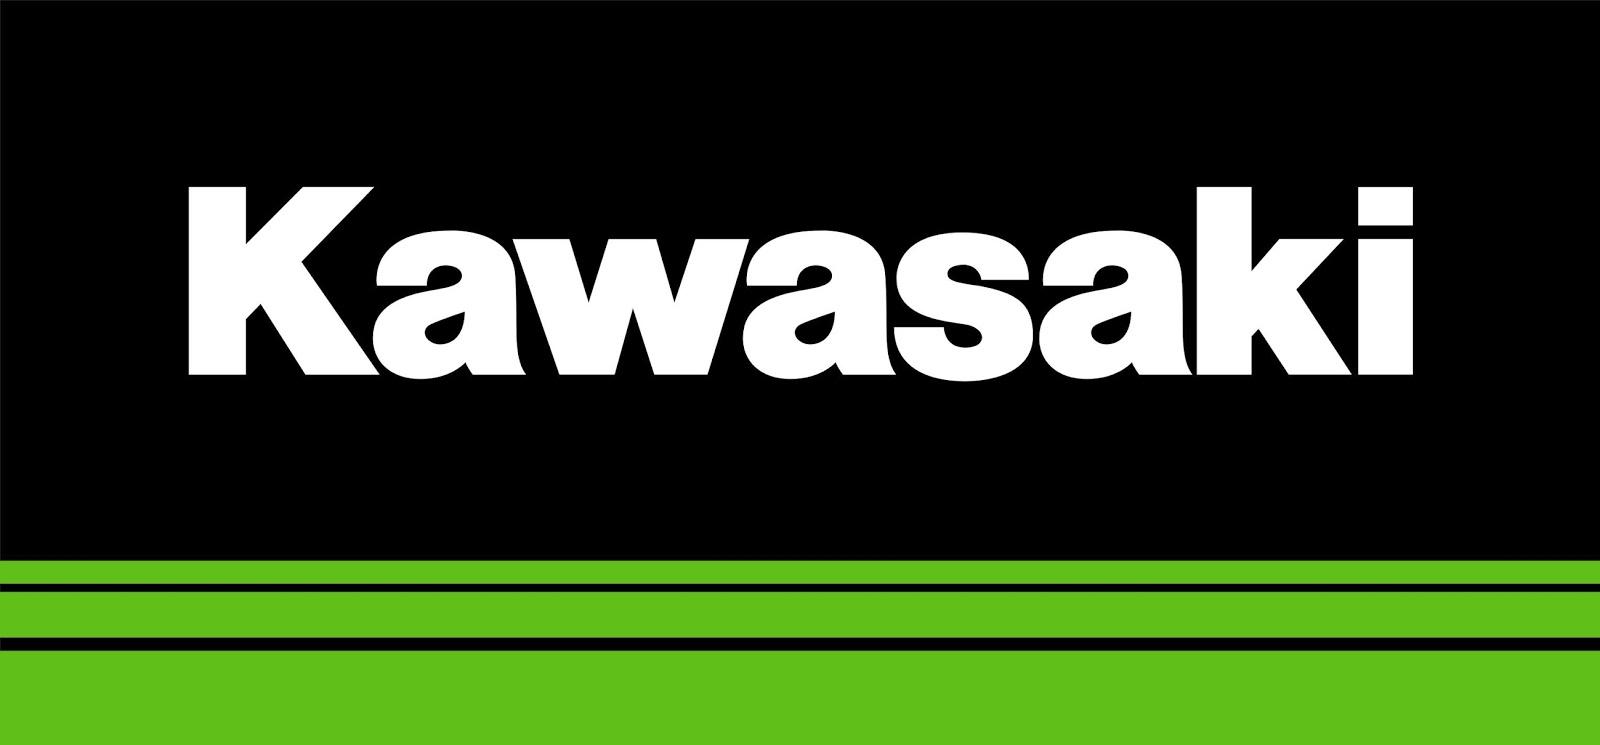 Lowongan Kerja MM2100 Bulan November 2018 PT. Kawasaki Motor Indonesia